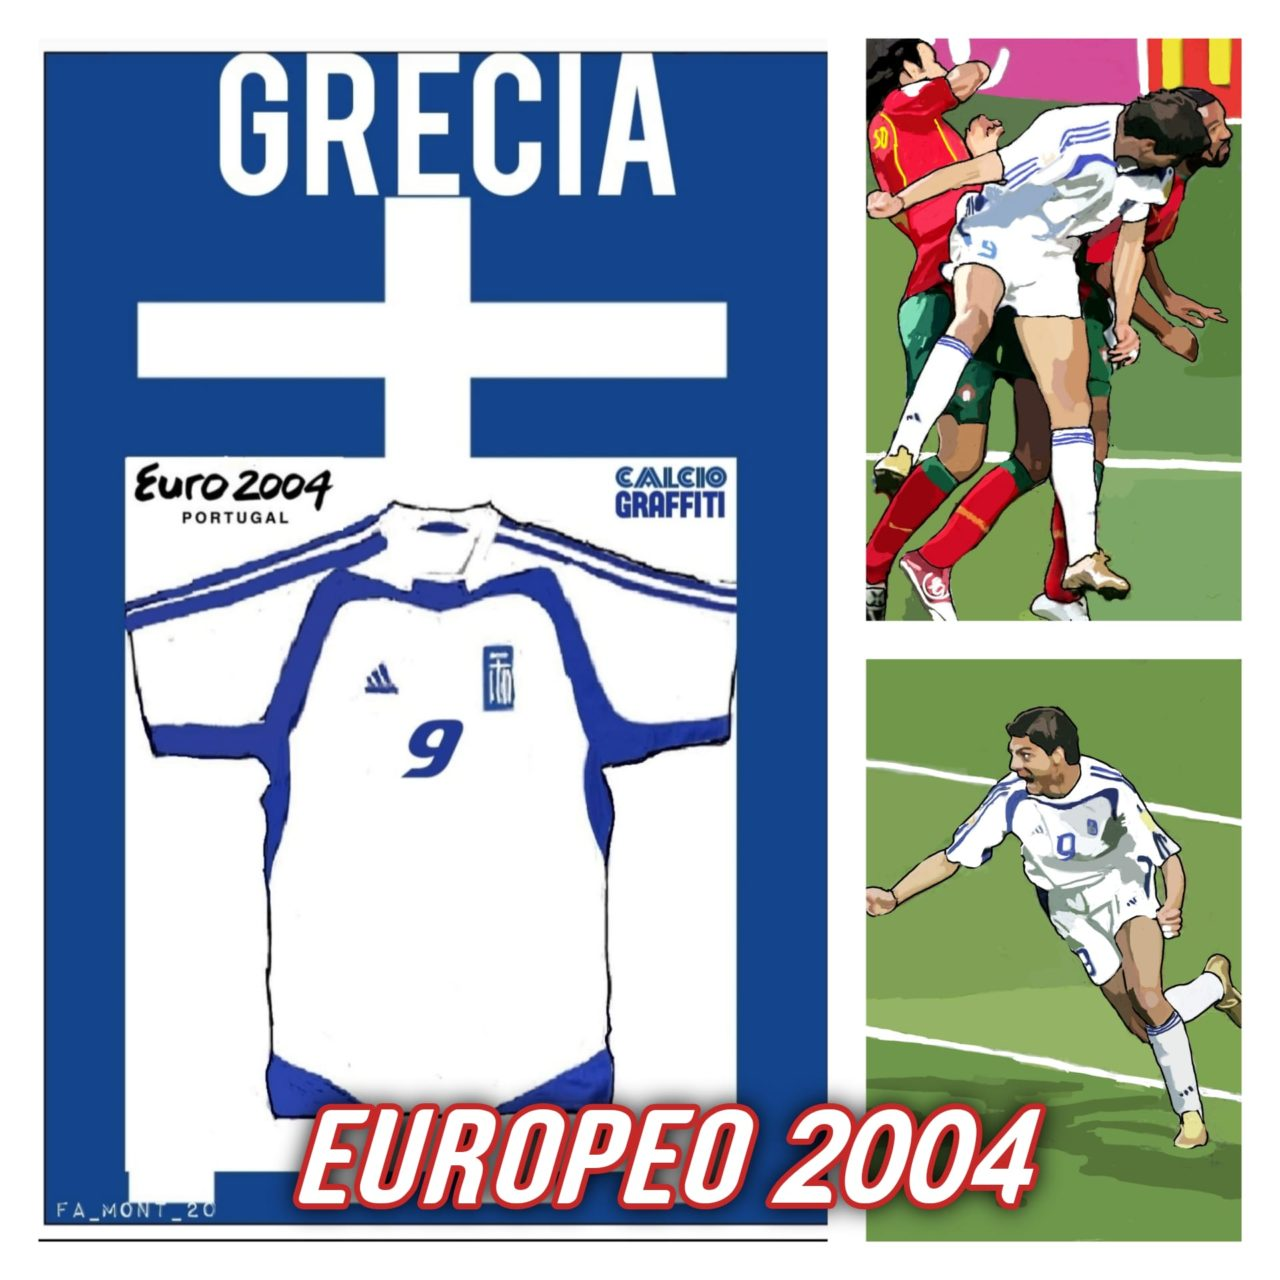 GRECIA 2004. LA FAVOLA EUROPEA